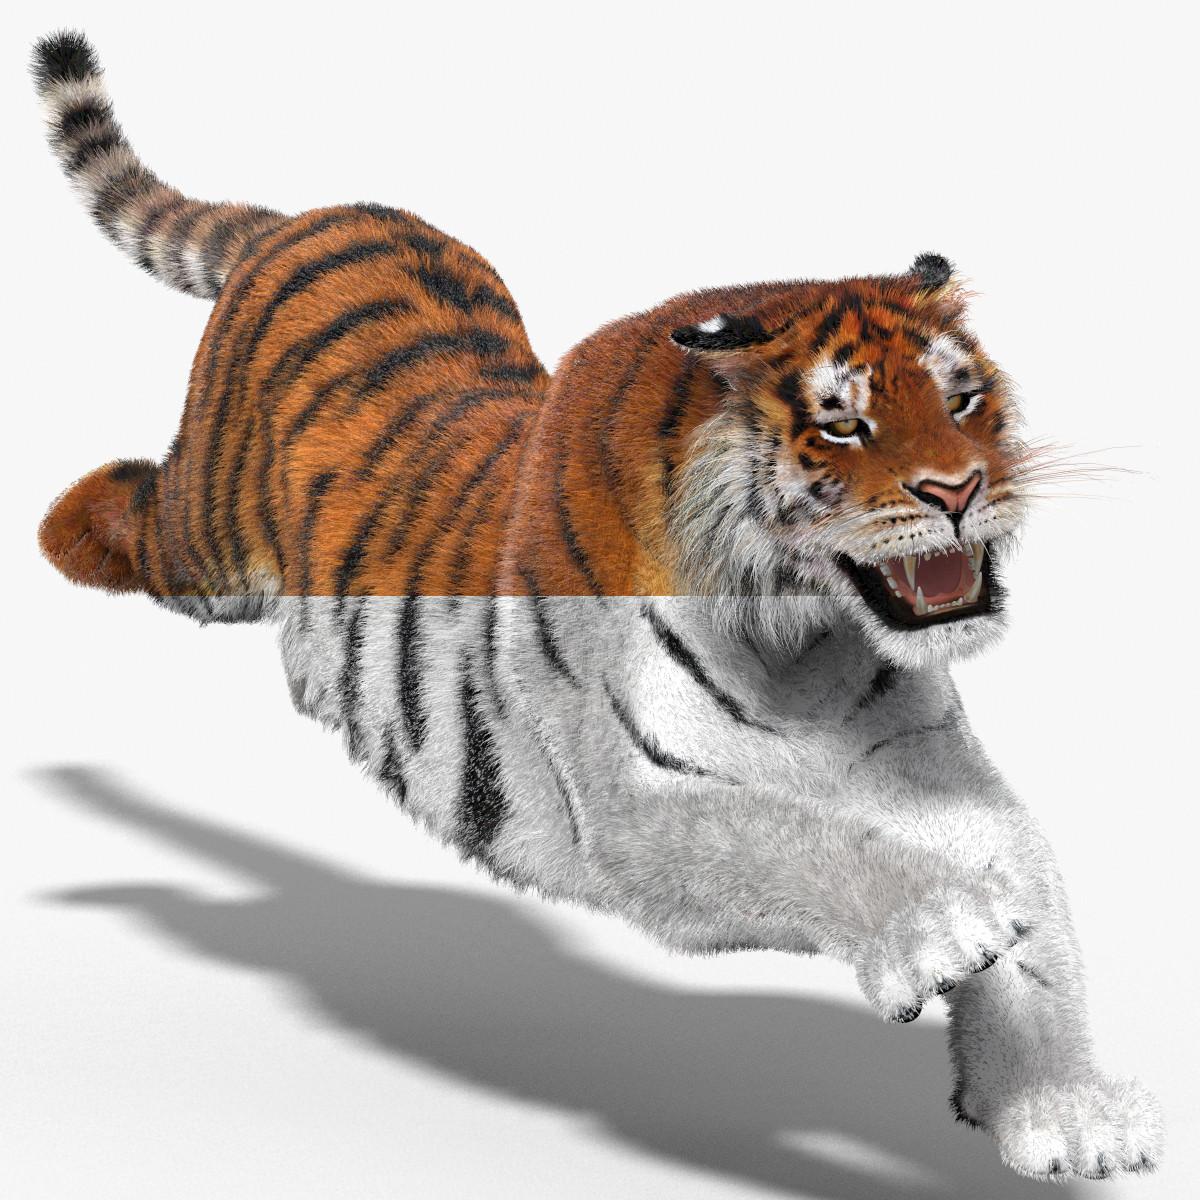 Tiger-3D-model-animated-fur-00.jpg